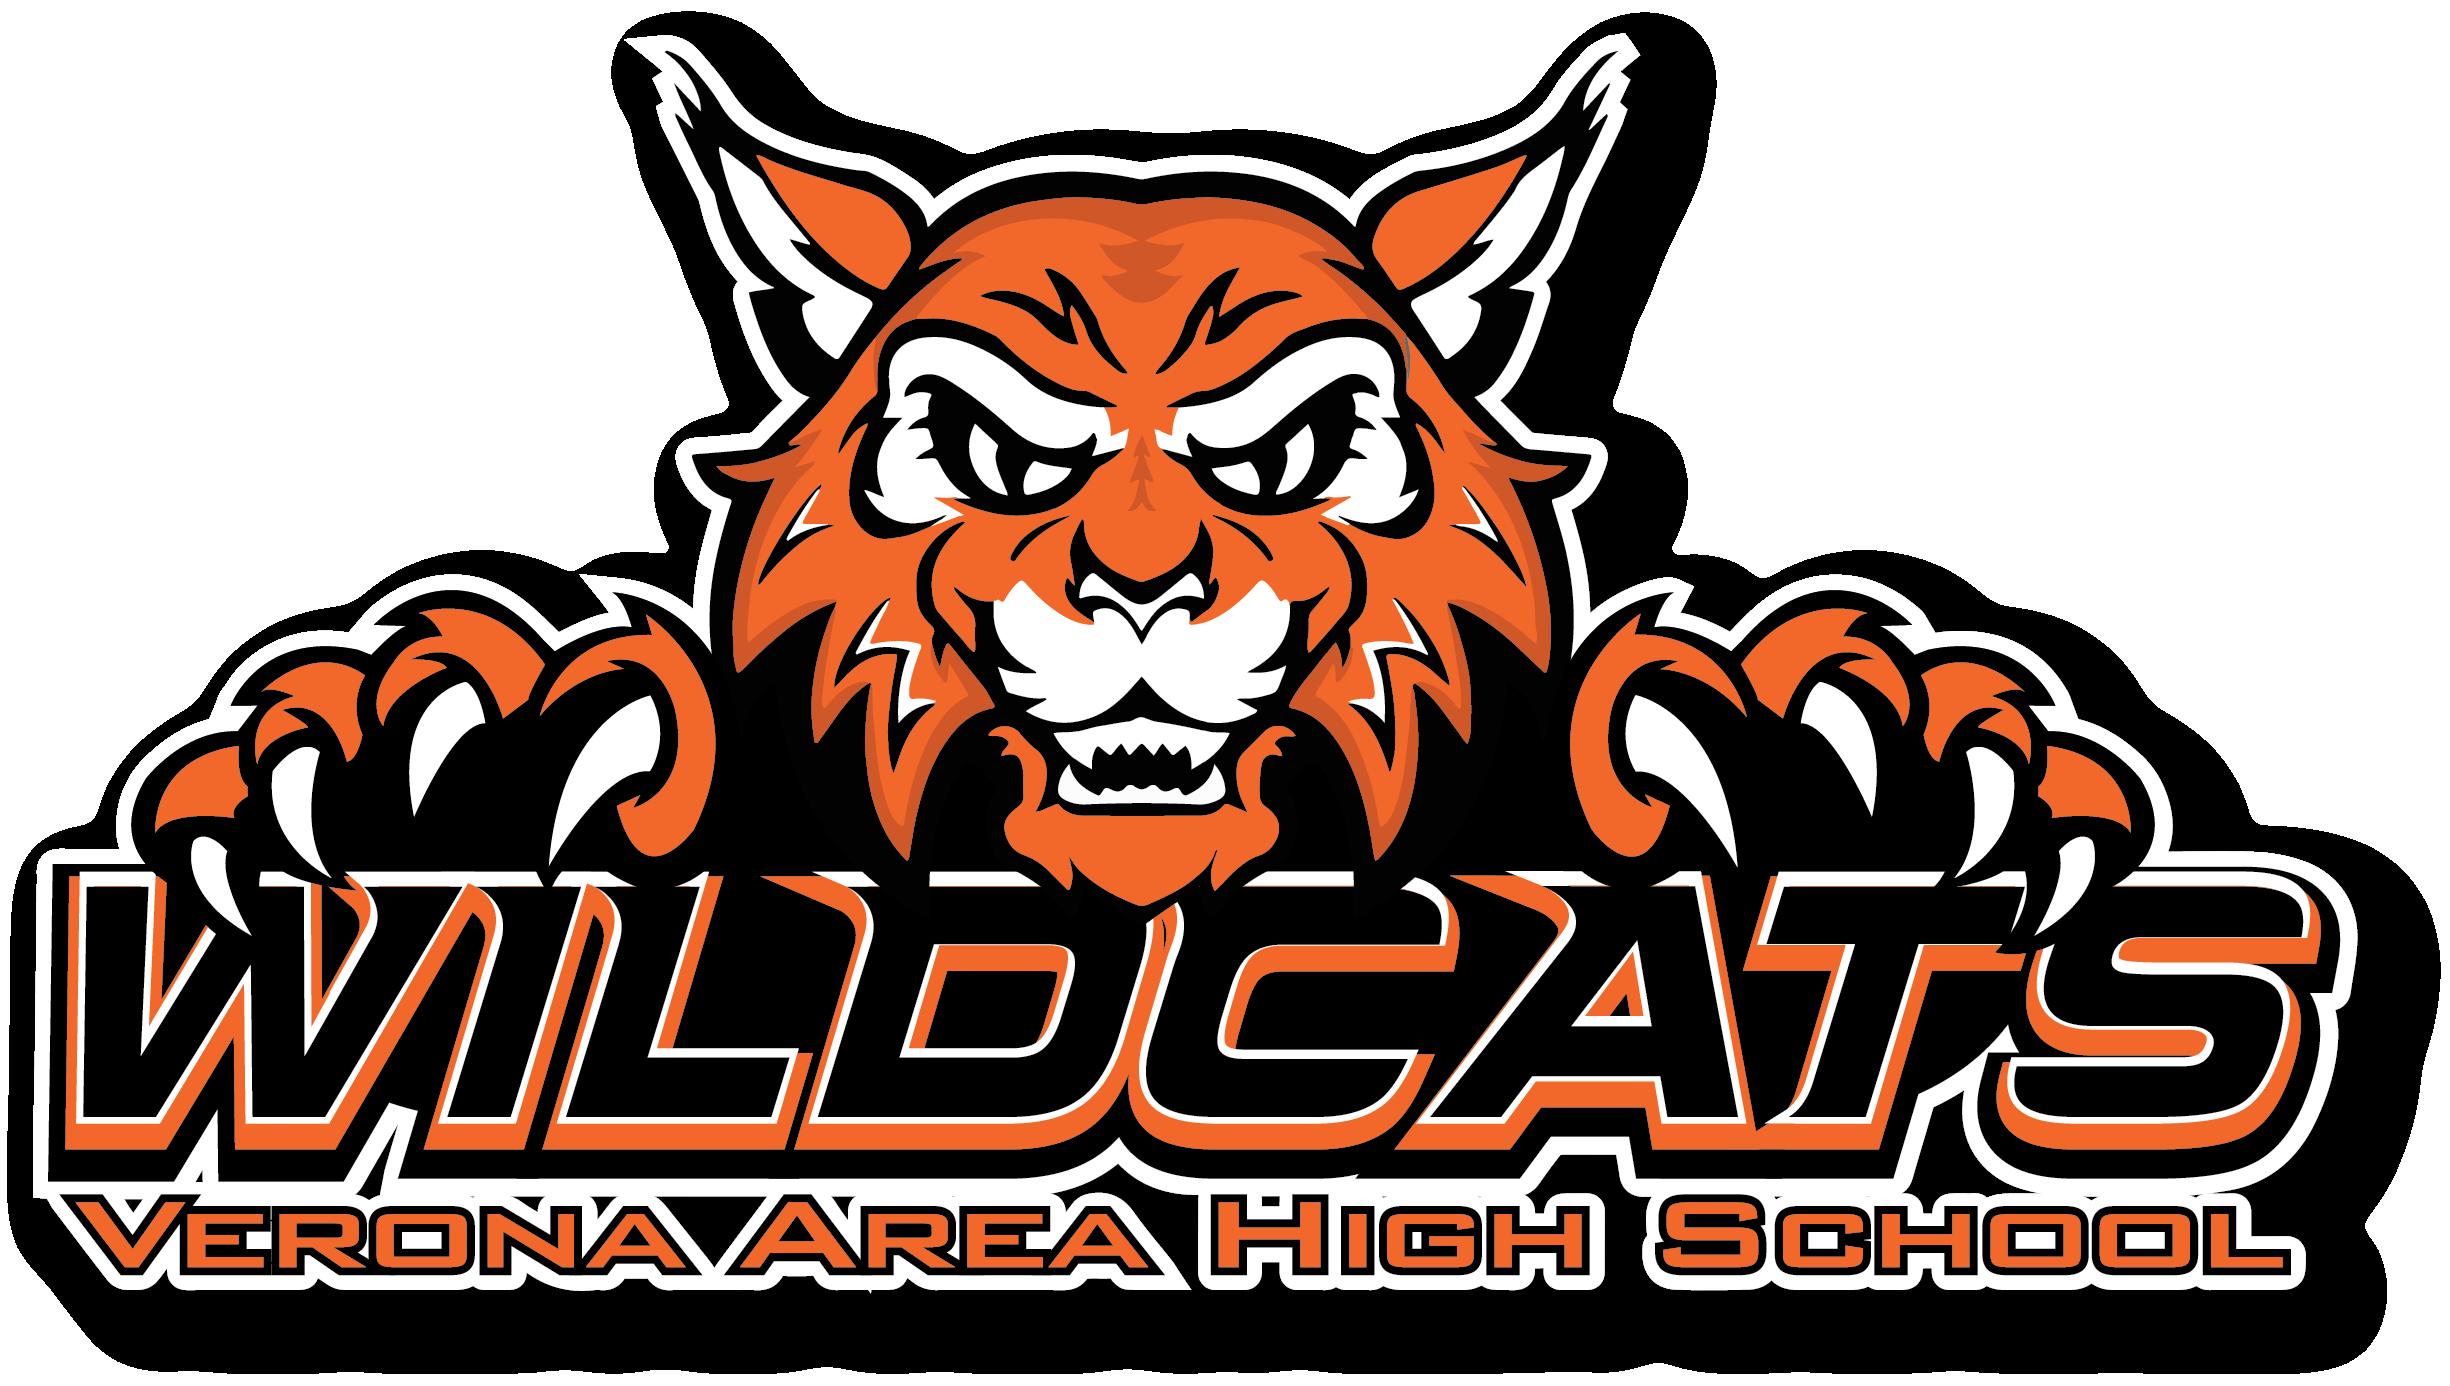 Verona Area High School logo